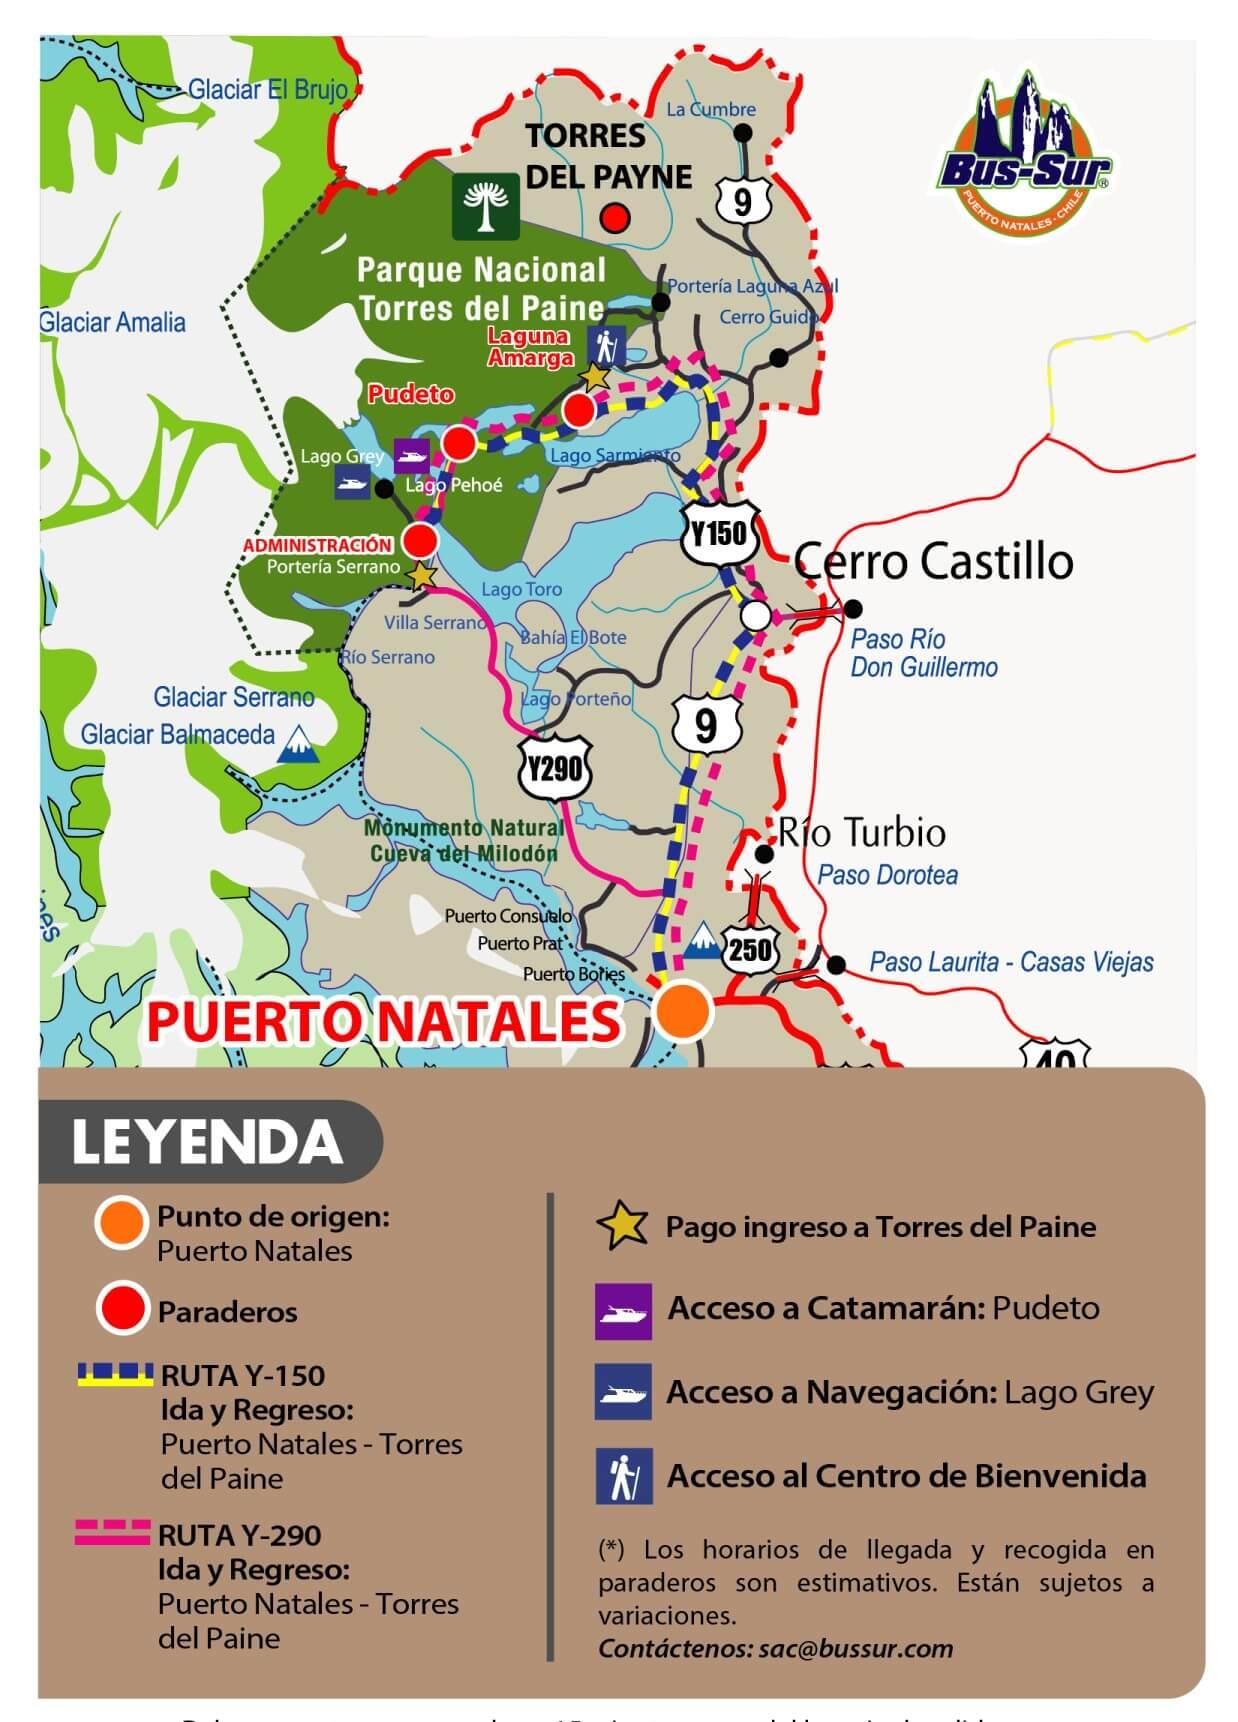 Venta de pasajes Puerto Natales Torres del Paine